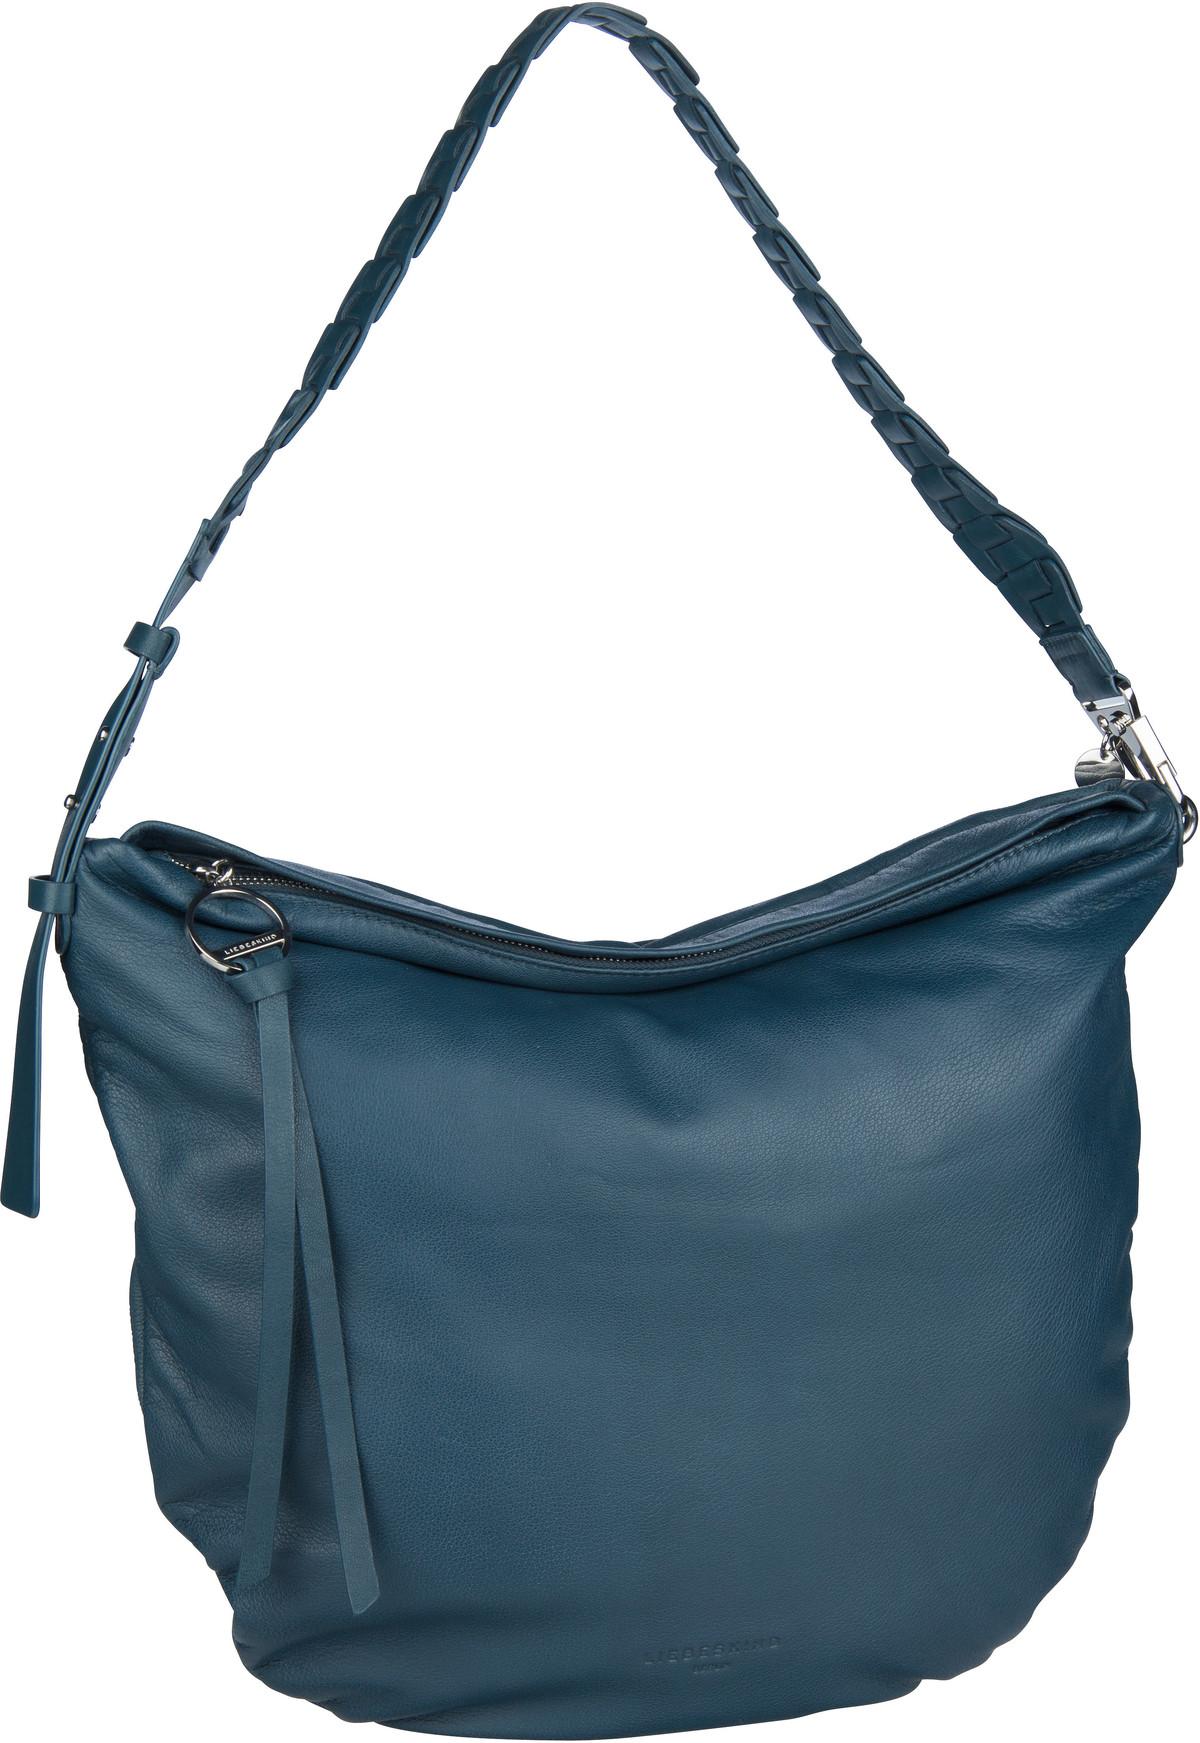 Berlin Handtasche Dive Bag 2 Hobo M China Blue